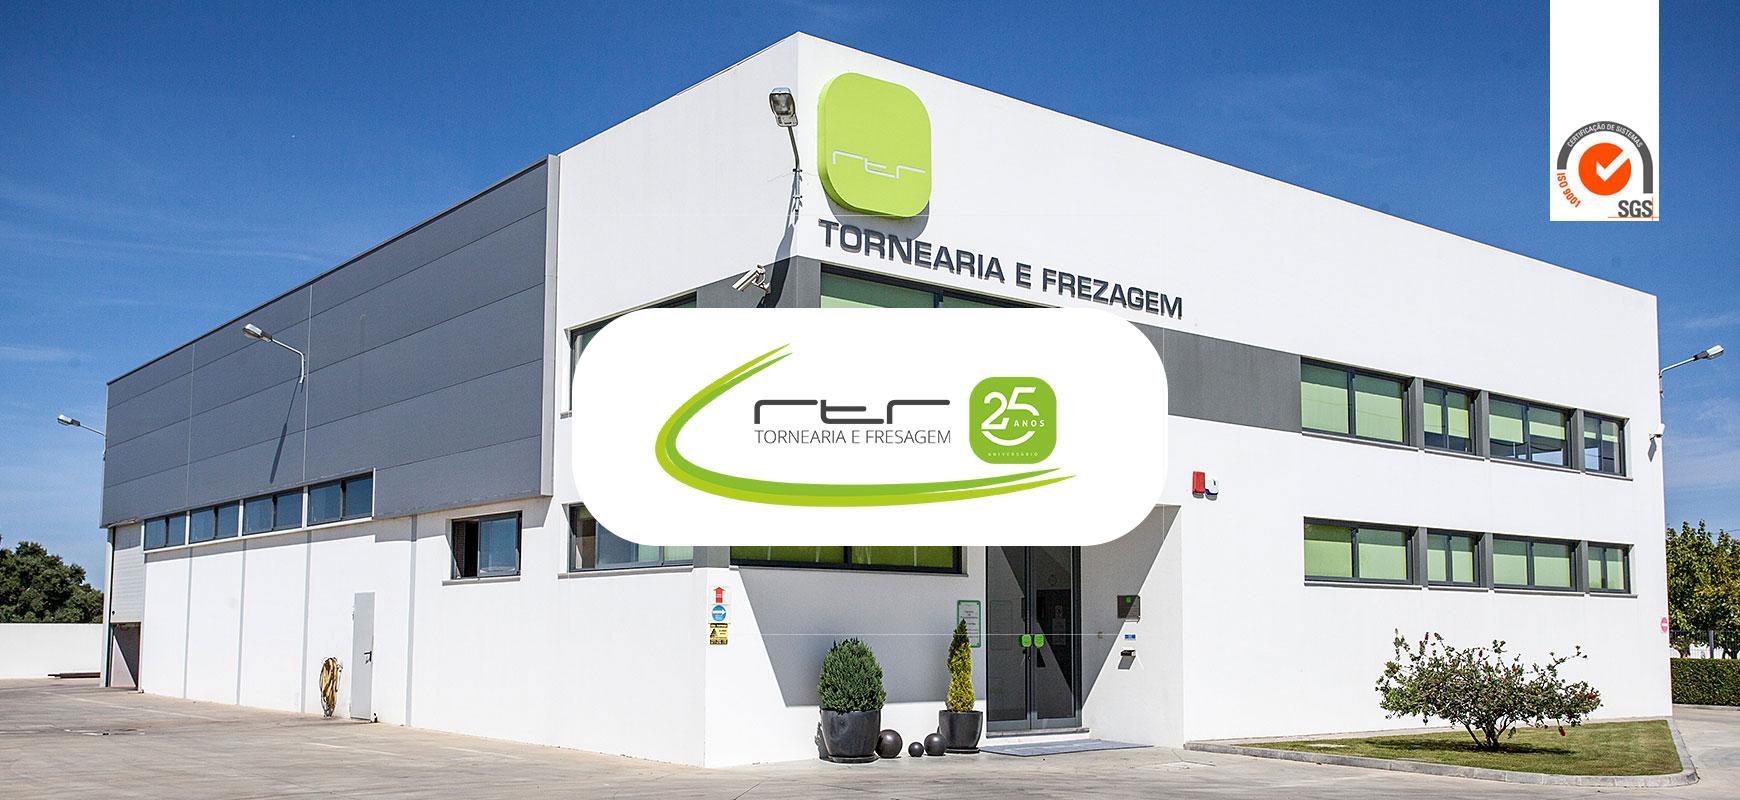 RTR Tornearia e Frezagem, Lda